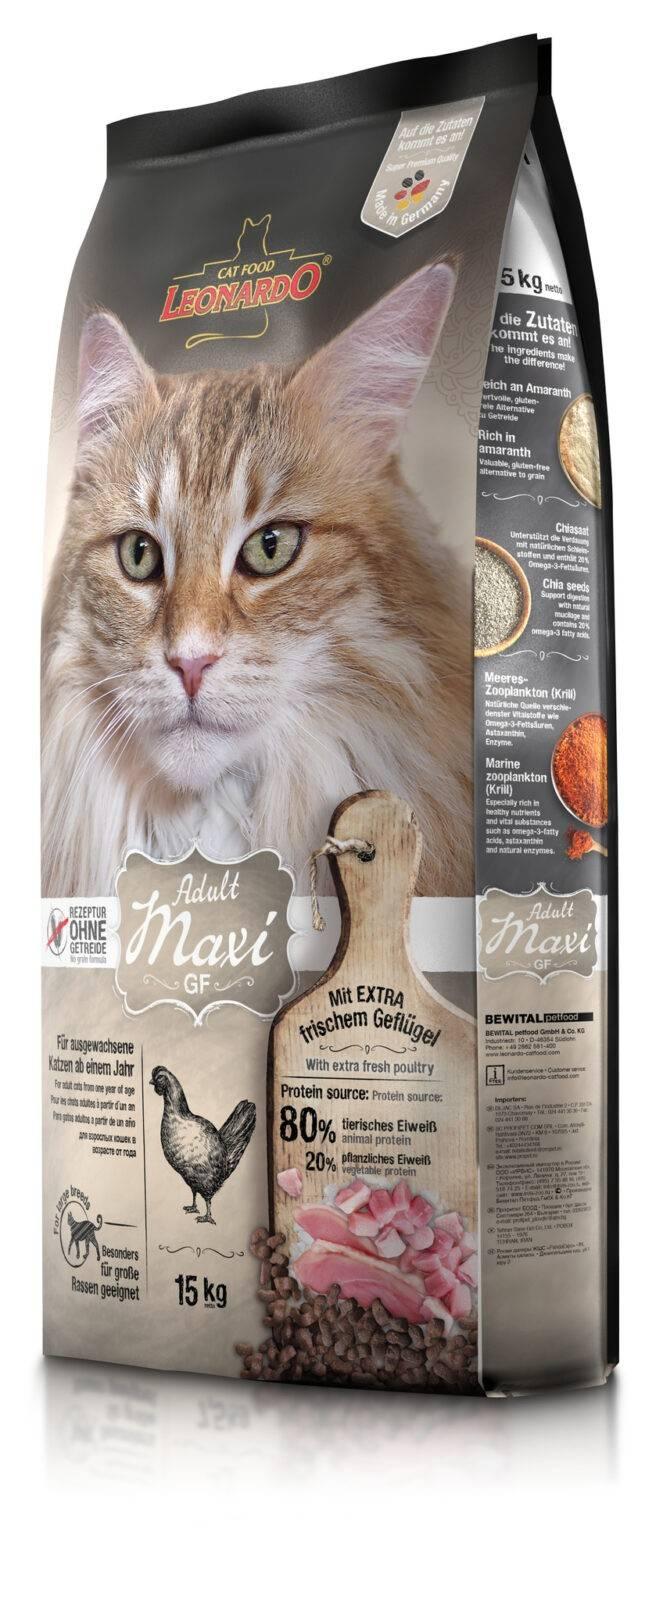 Корм леонардо (leonardo) для кошек | состав, цена, отзывы